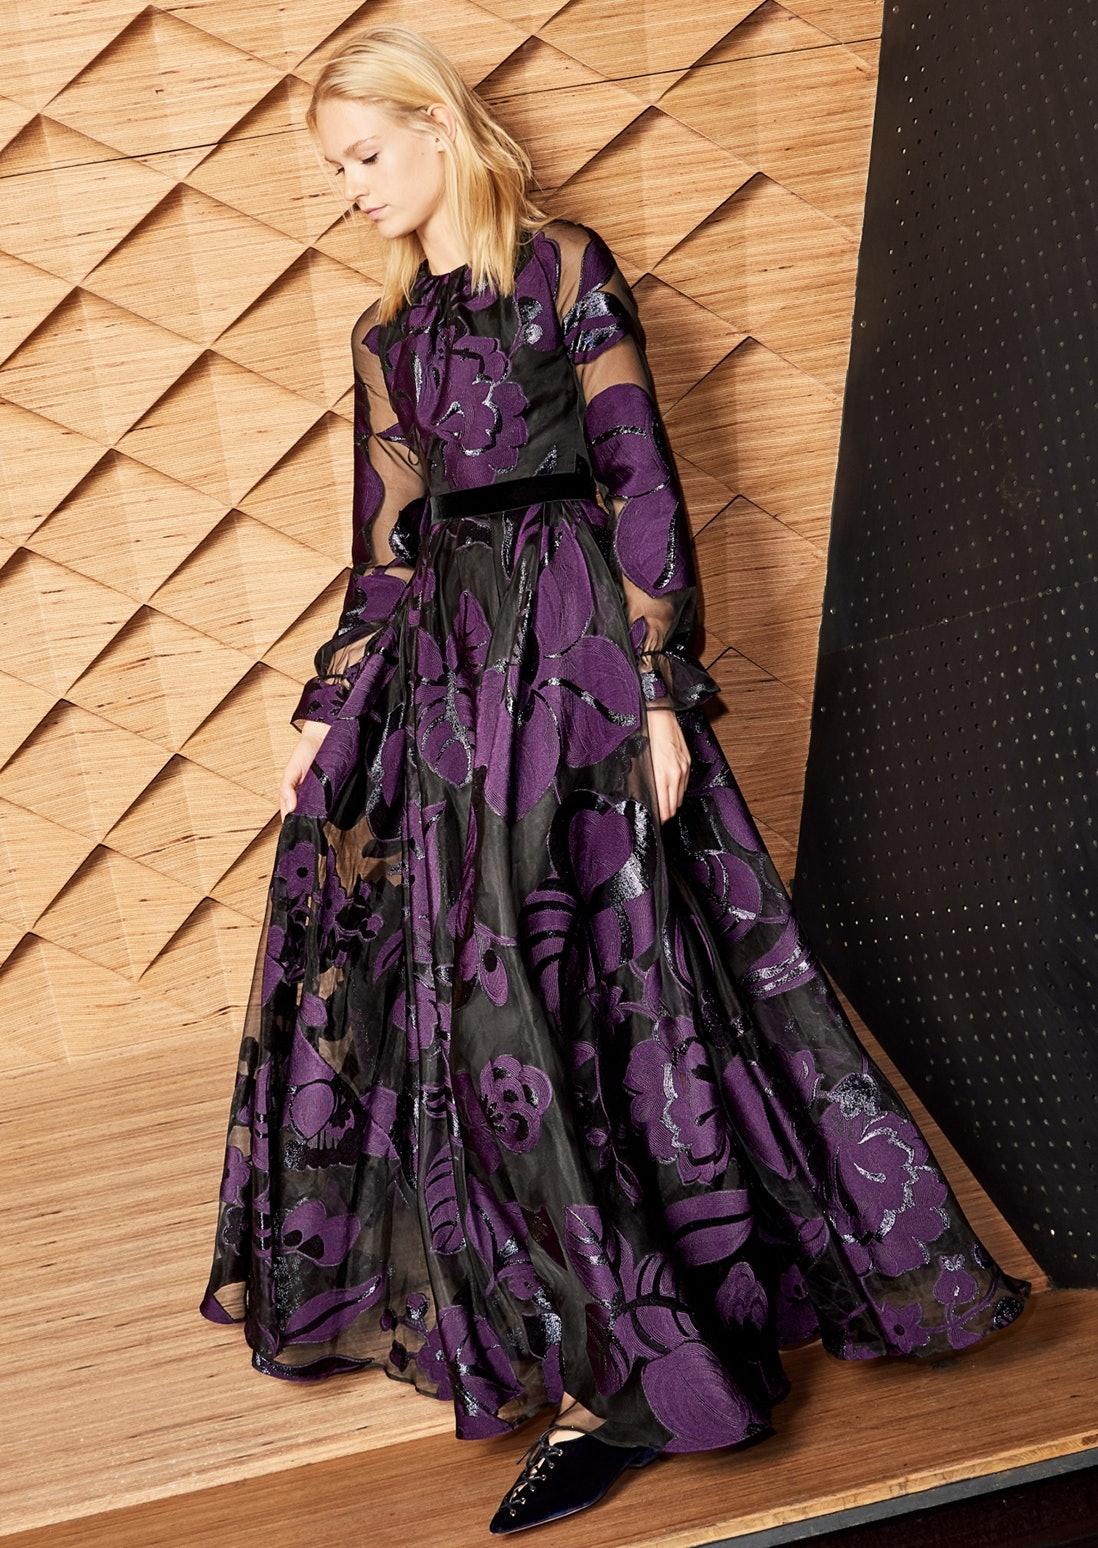 Talbot Runhof, Evening Gown, Abendkleid, Robe, Dress, Oscars, Academy Awards, Lodenfrey